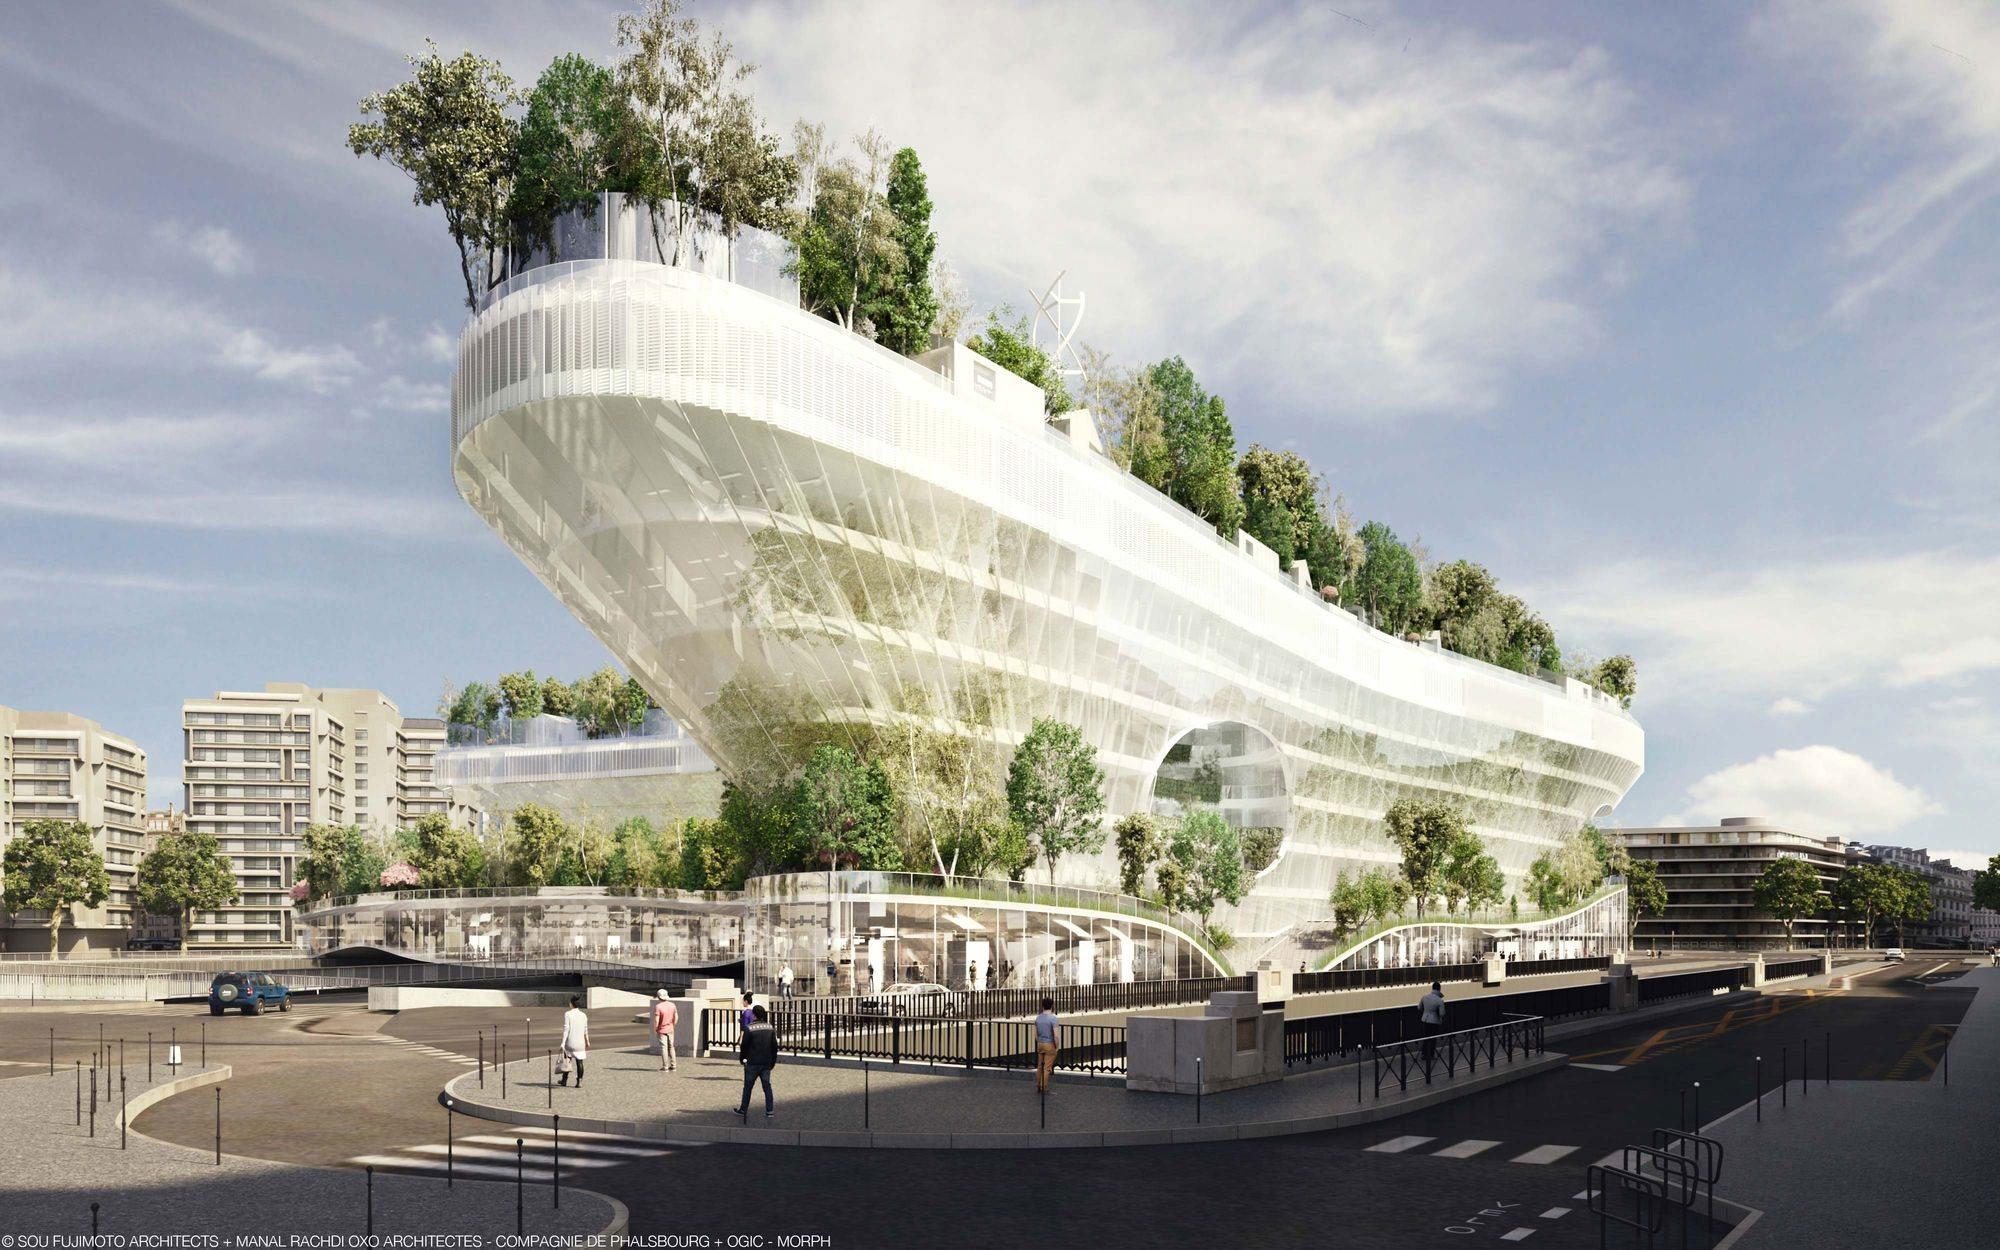 sou fujimoto oxo architectes milles arbres in paris stefano boeri architetti. Black Bedroom Furniture Sets. Home Design Ideas